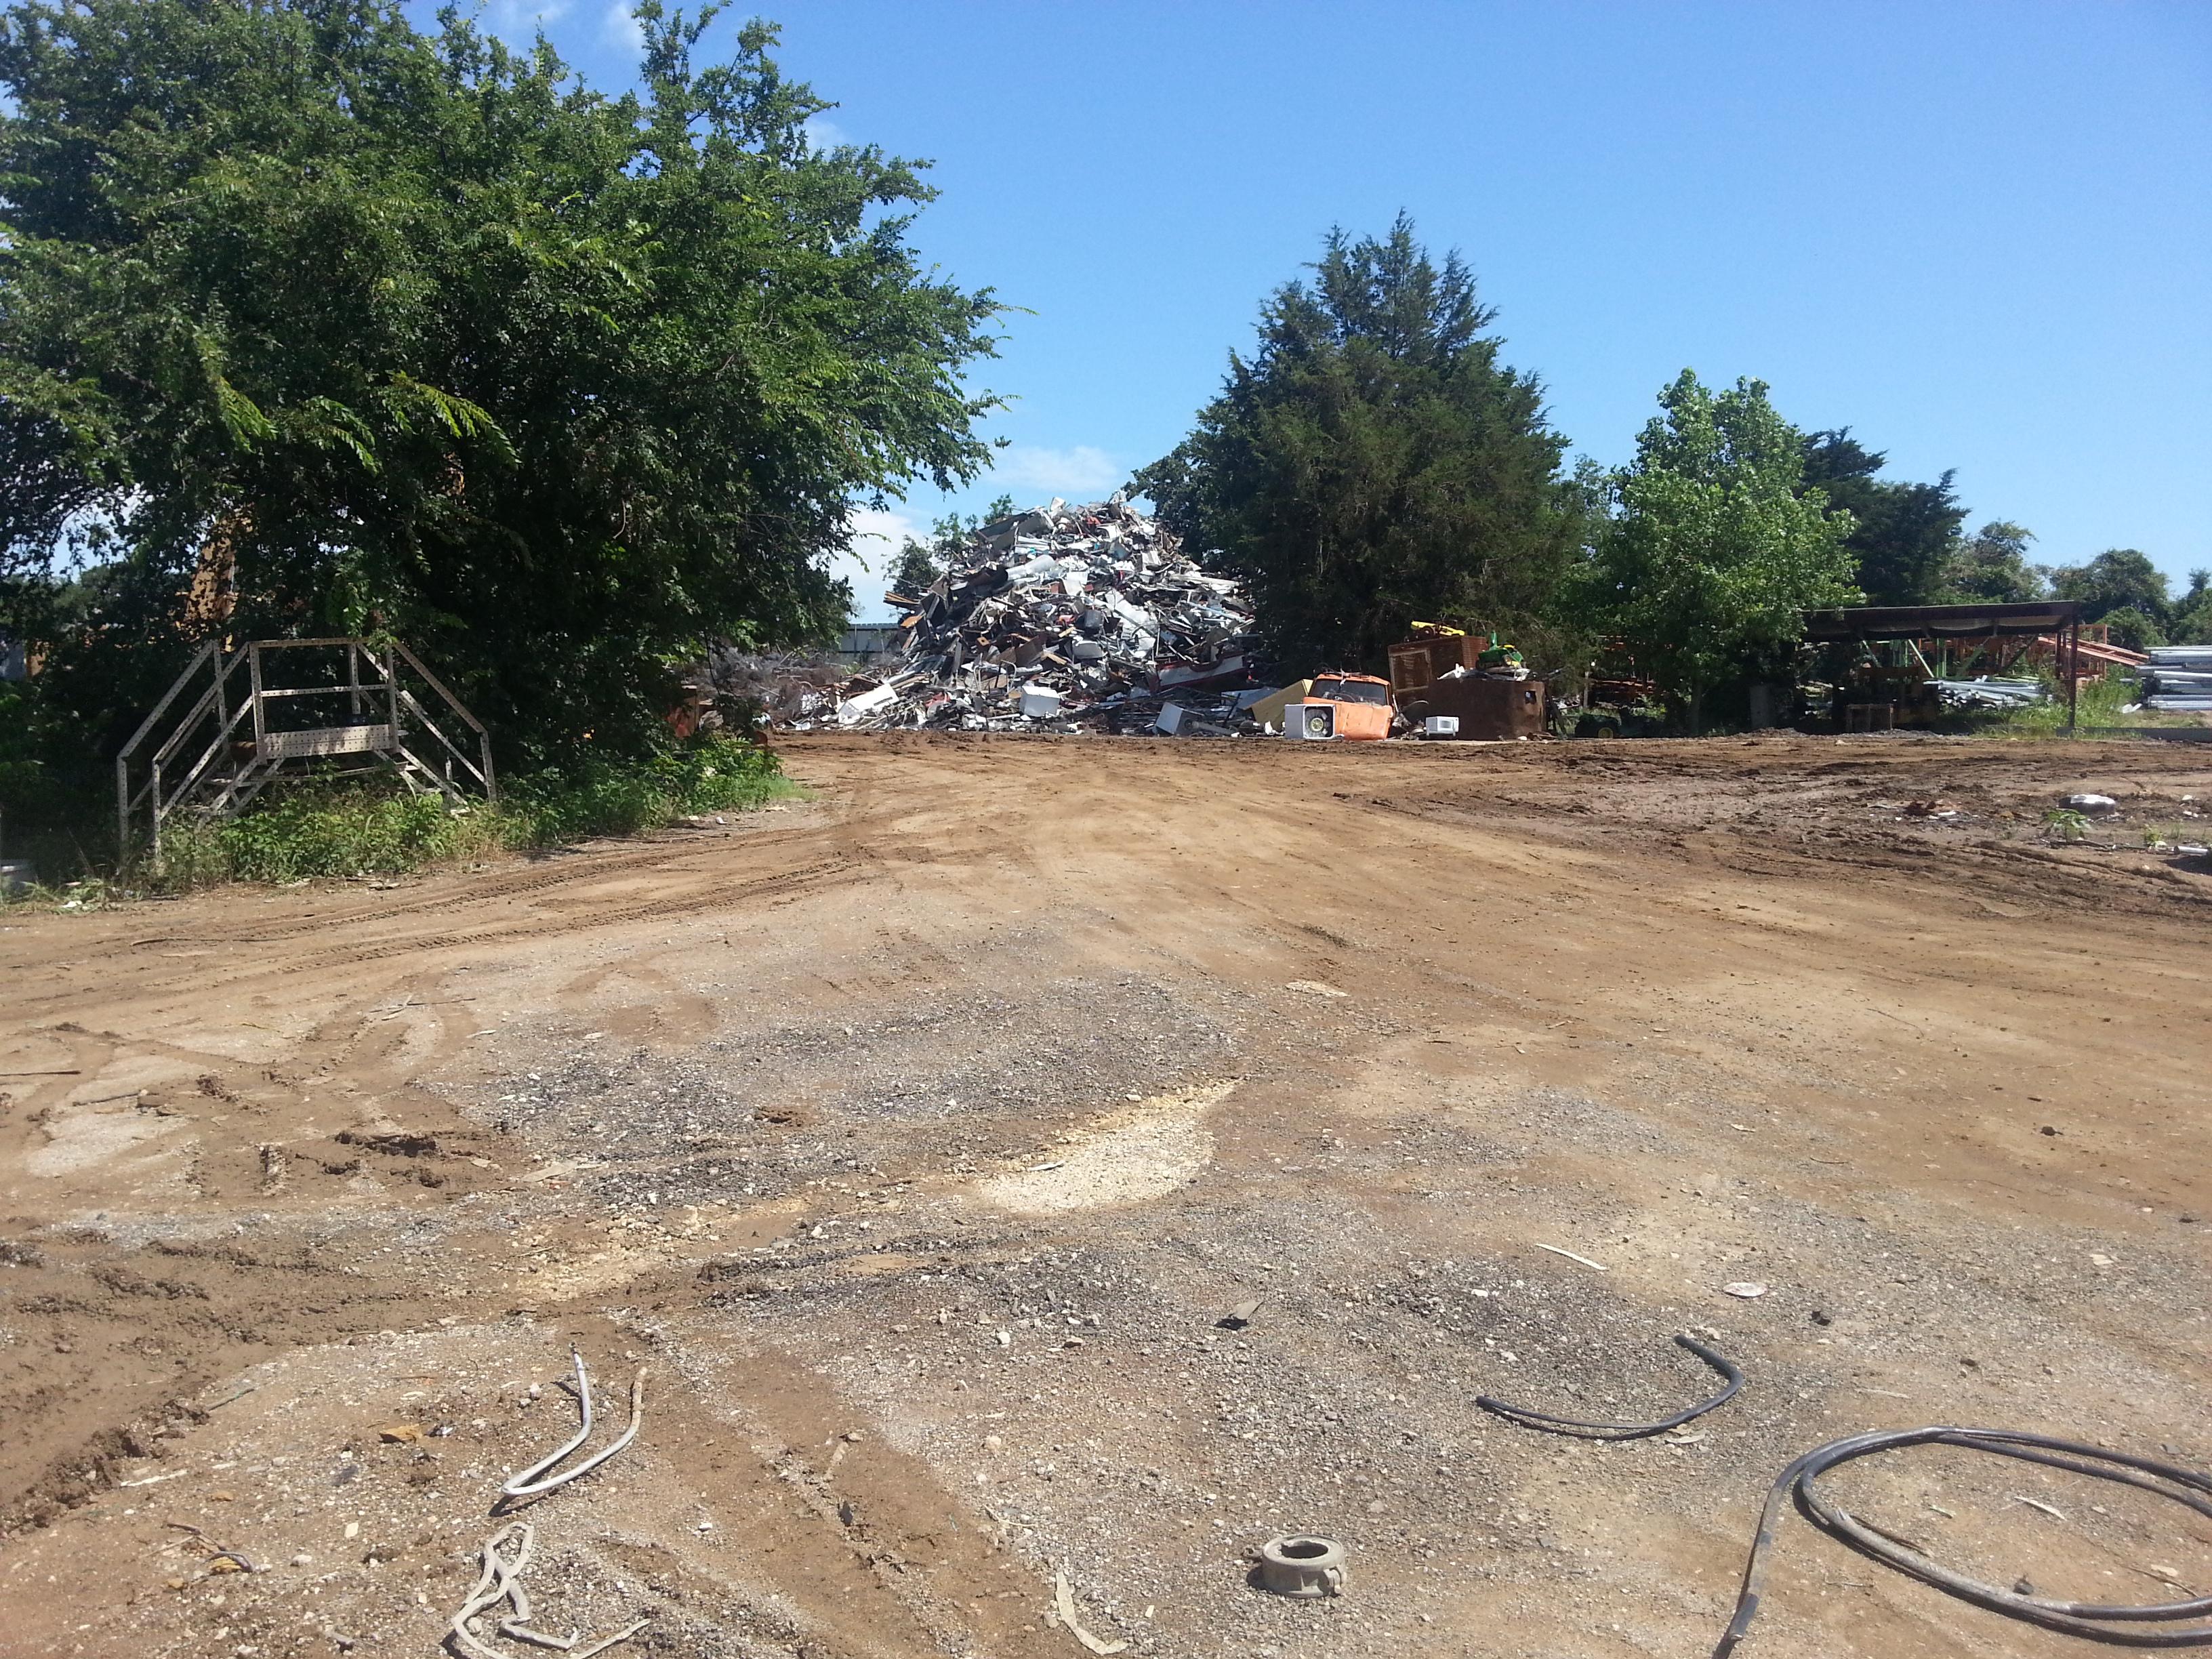 Scrap yard where I purchased the metal